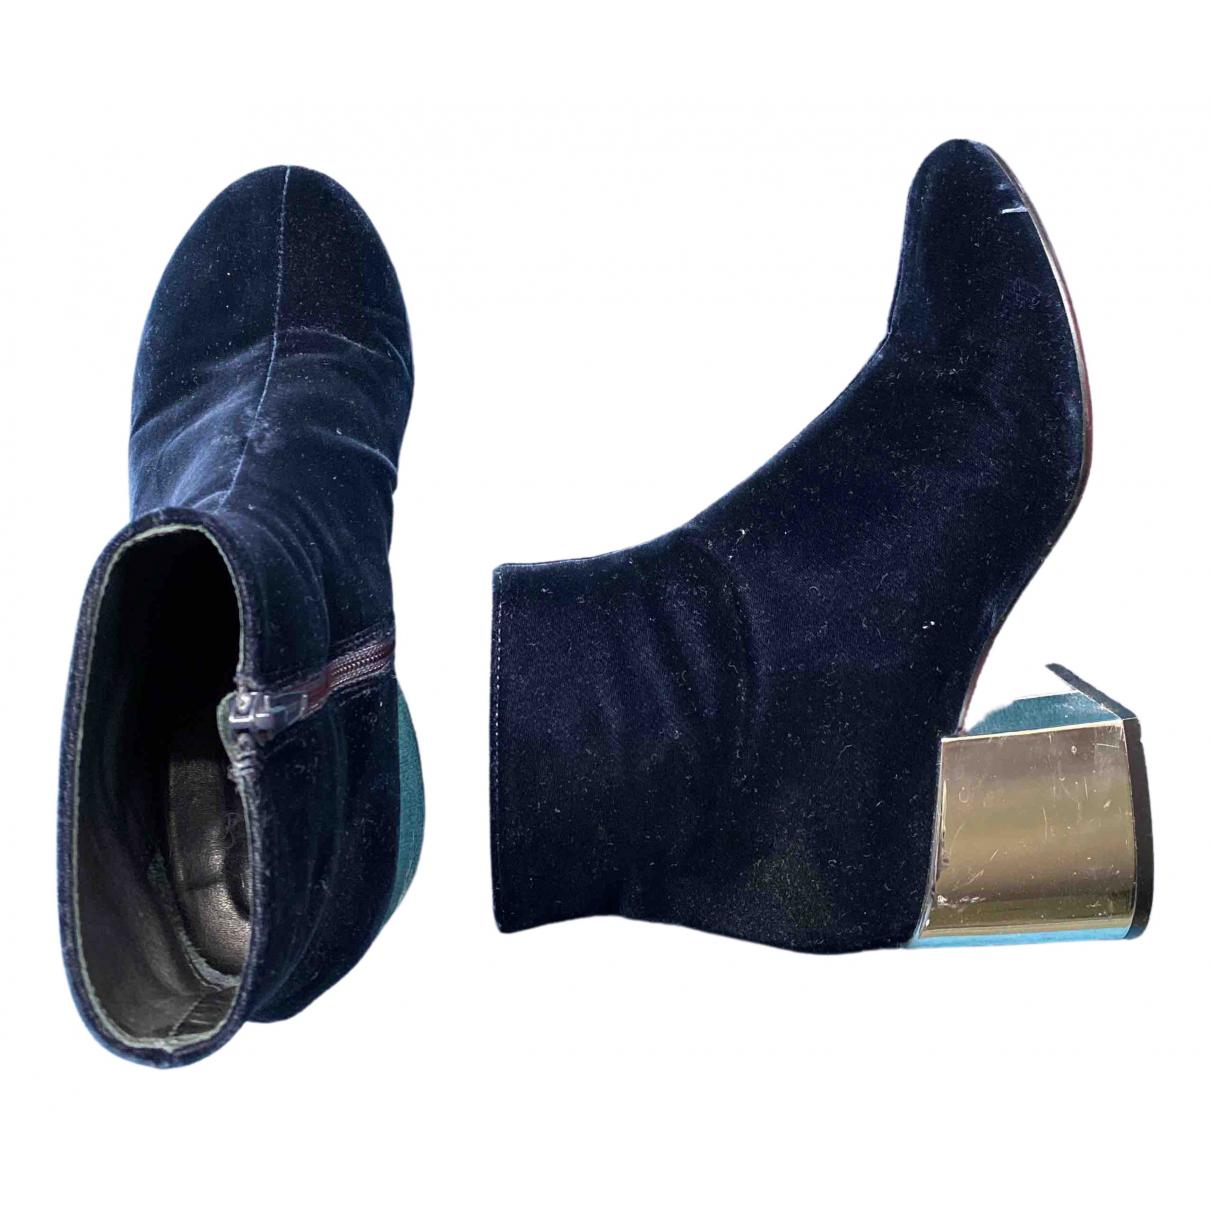 Mm6 \N Stiefeletten in  Blau Samt